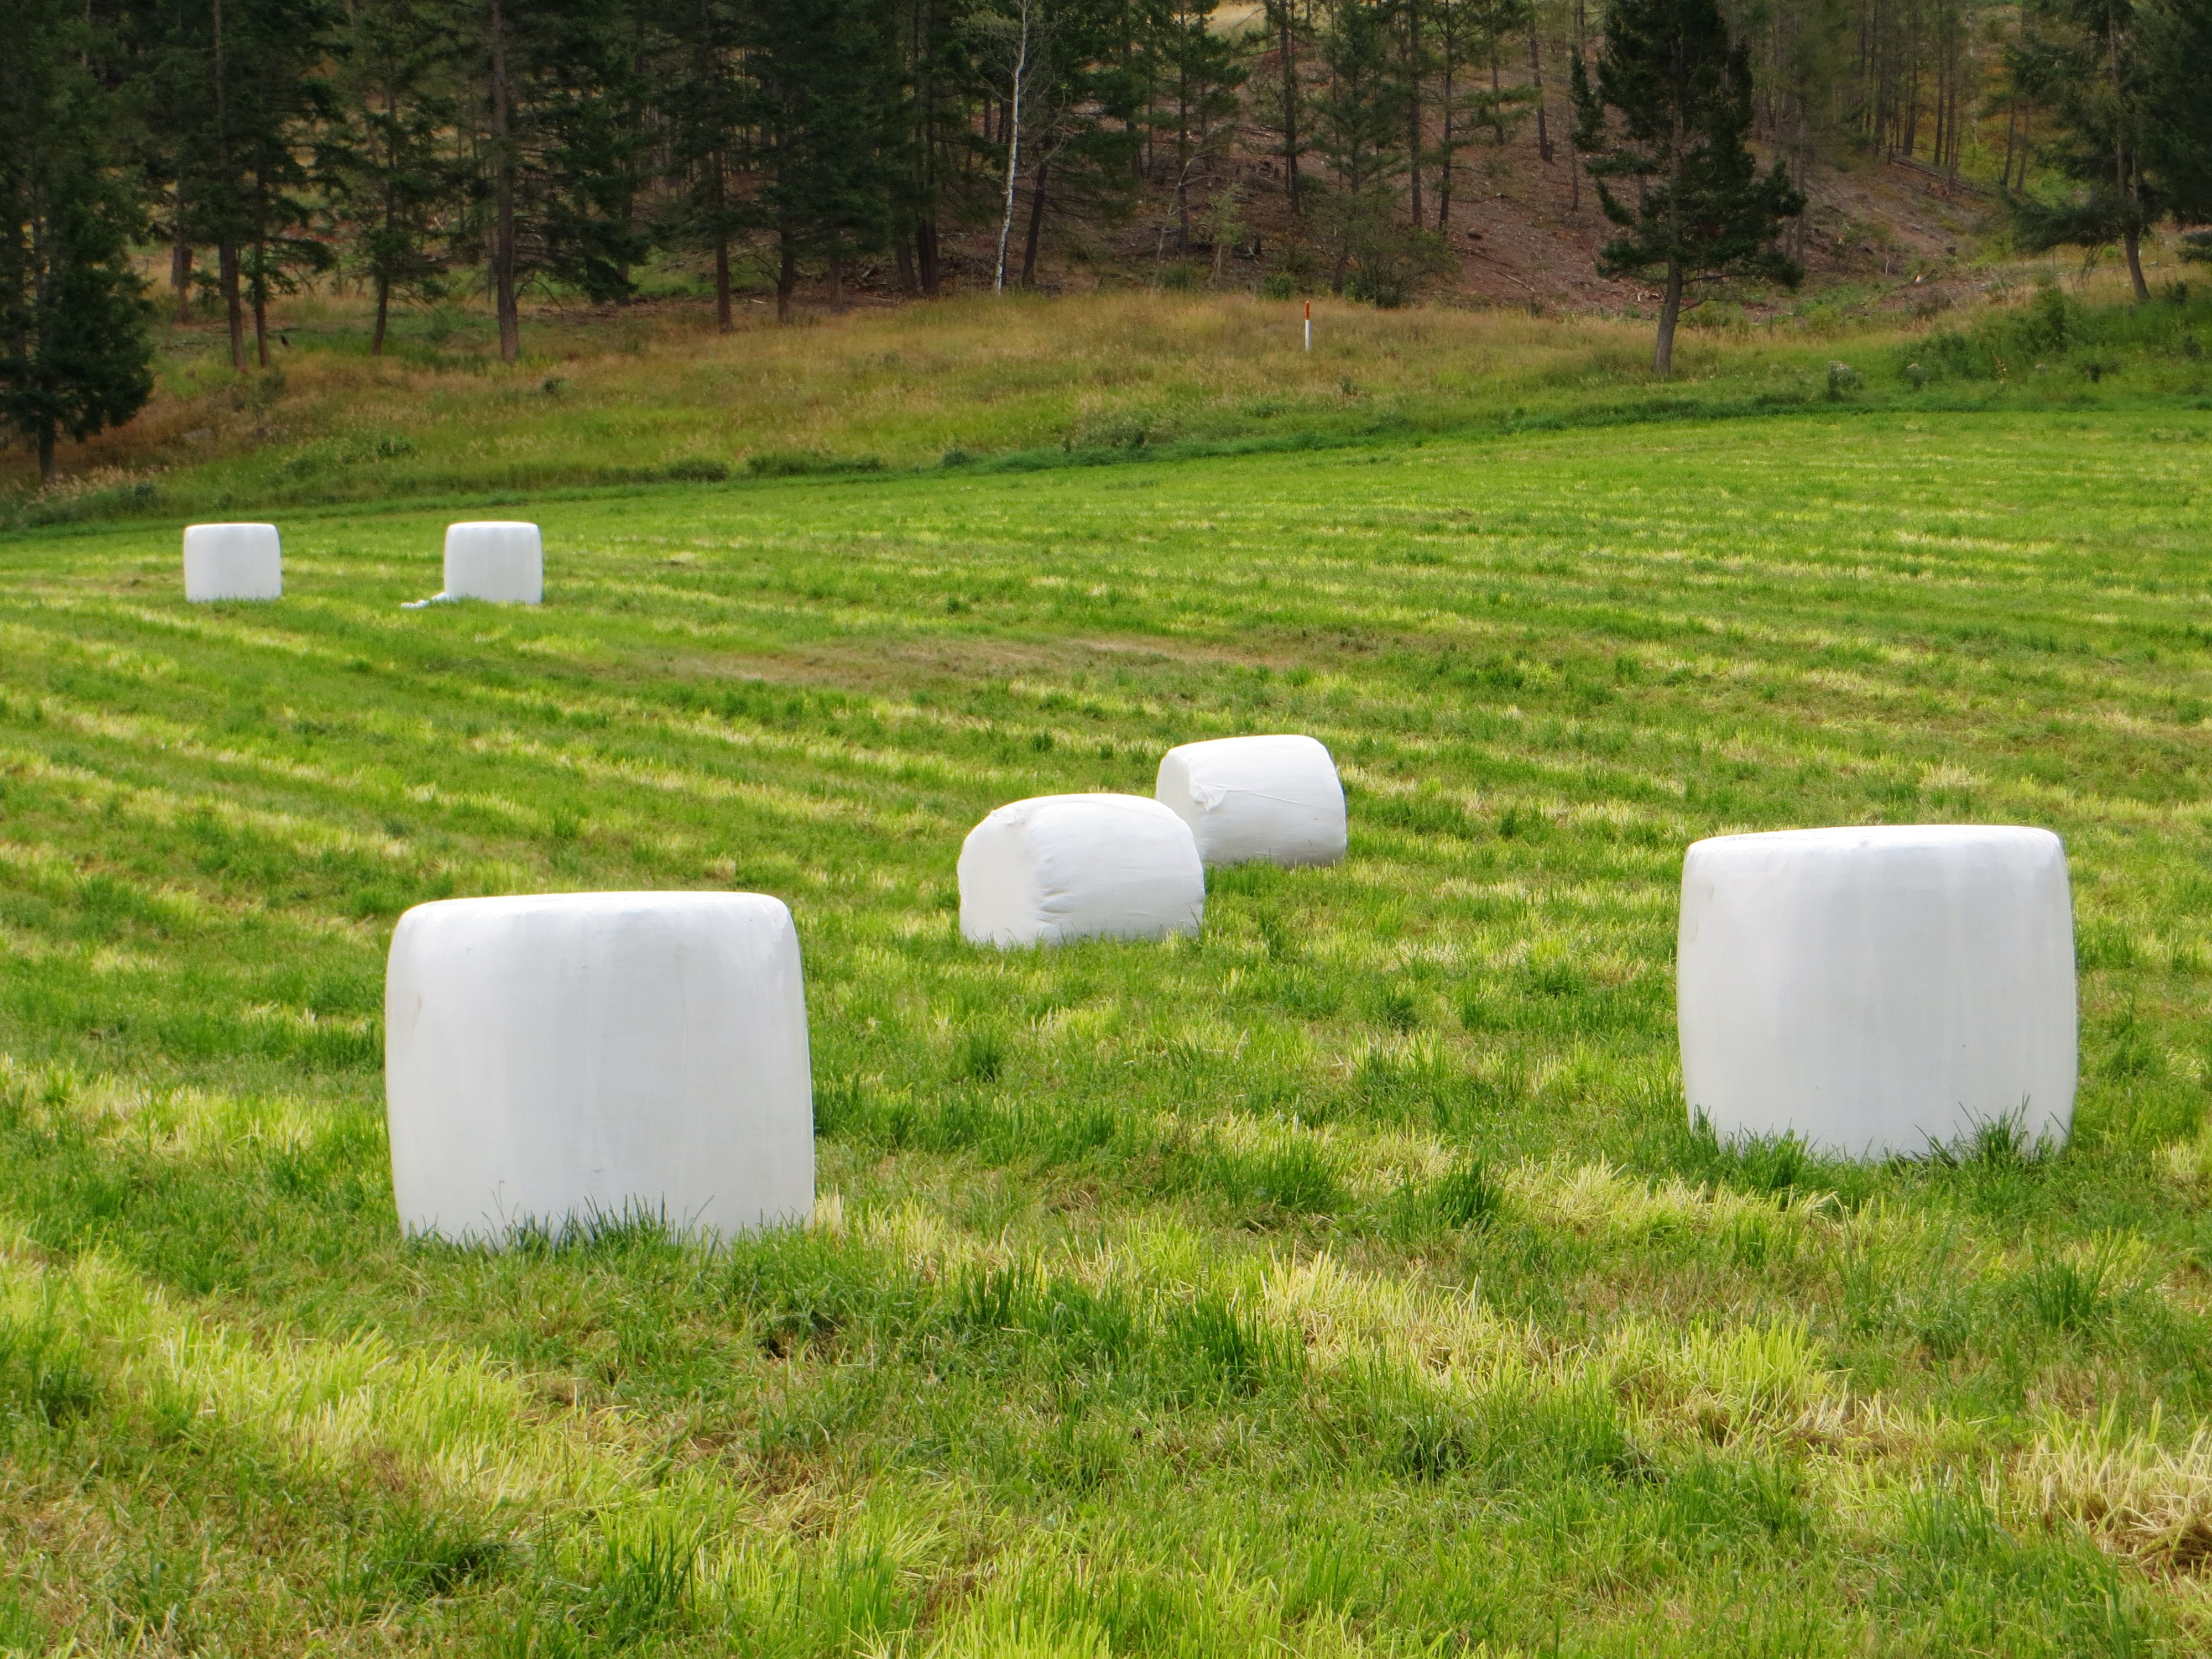 Marshmallow field hay bales